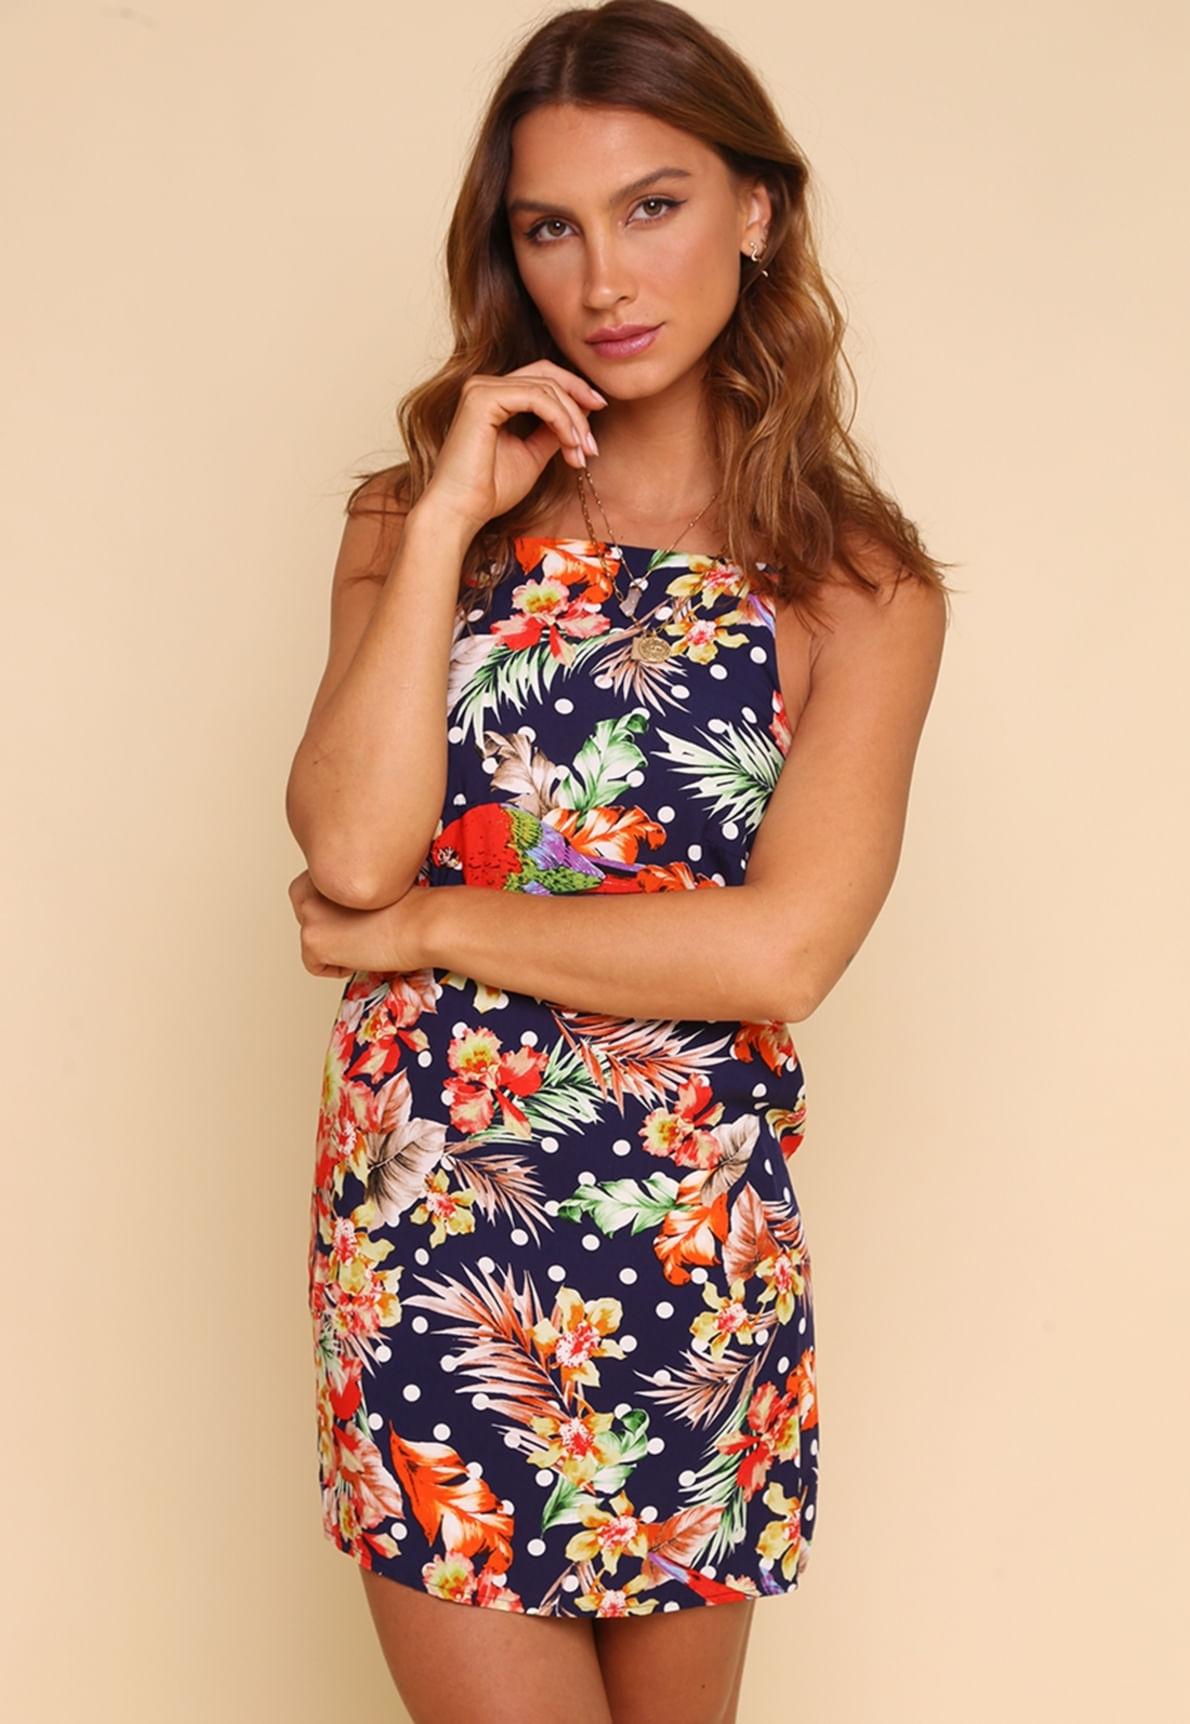 29504-vestido-floral-alison-mundo-lolita-02